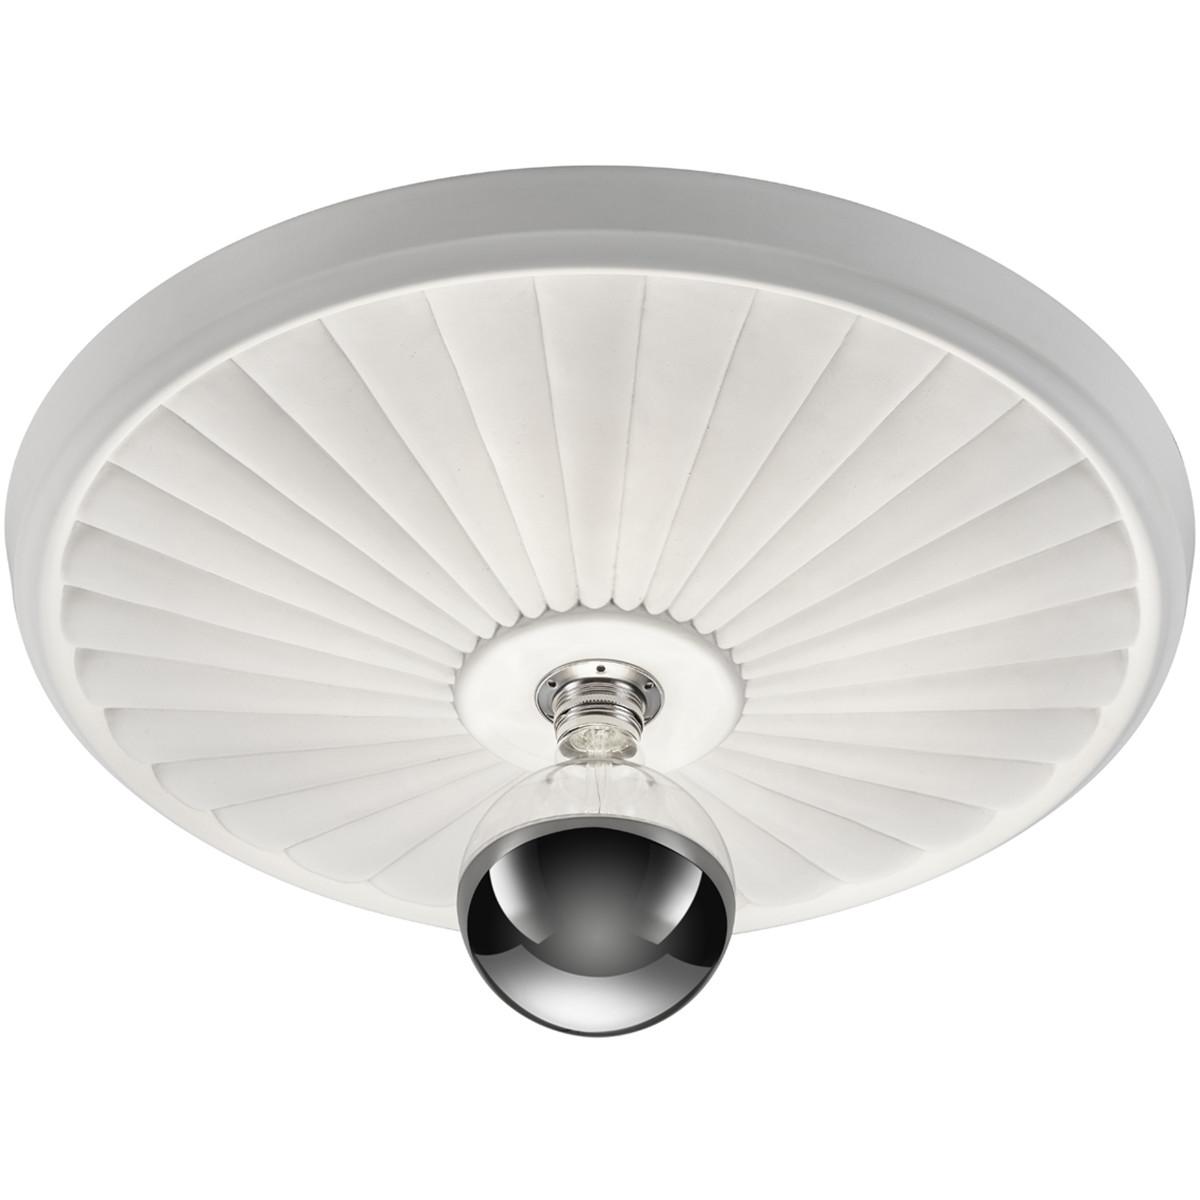 LED Plafondlamp - Plafondverlichting - Trion Corina XL - E27 Fitting - 1-lichts - Rond - Mat Wit - G